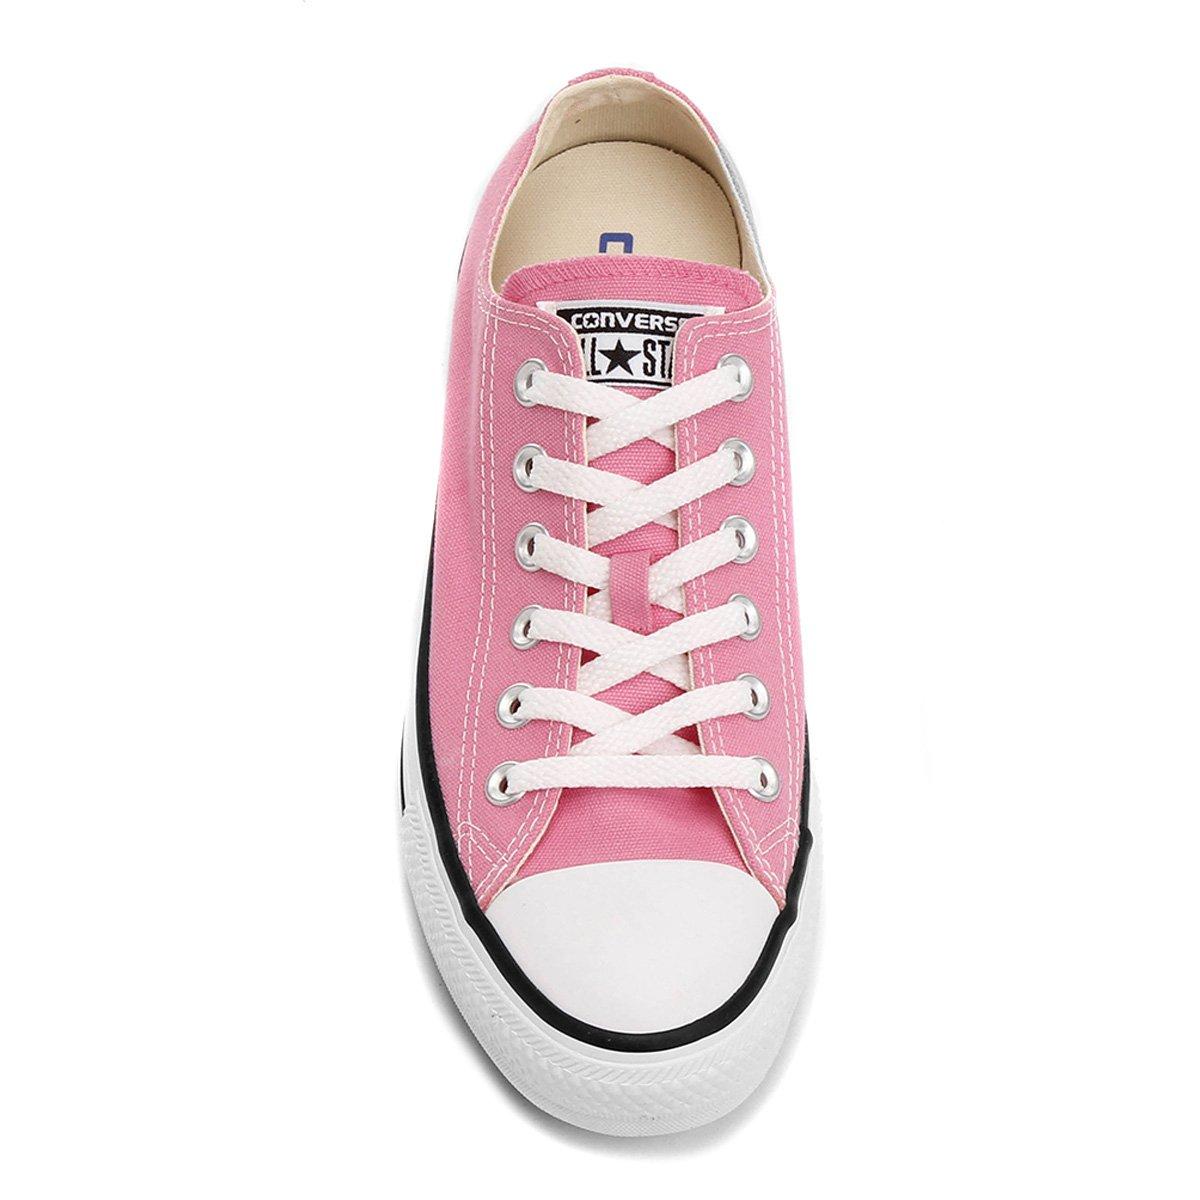 Tênis Converse All Star Ct As Core Ox - Rosa+Branco